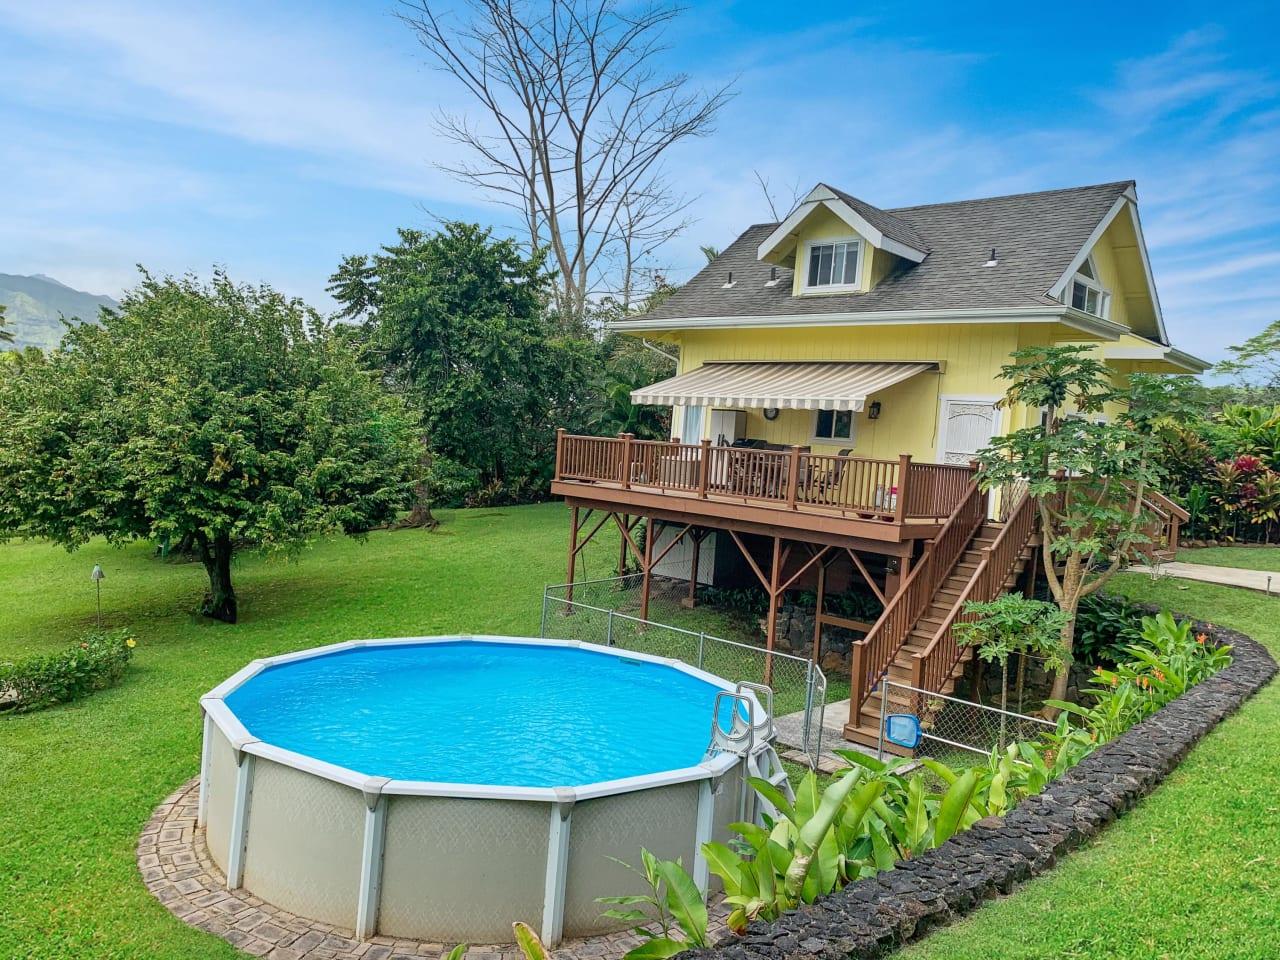 Kauai Real Estate, Poipu Median Home Price Breaks $1 Million, Poipu Beach Wellness Hotel Planned, Kauai Moves To Tier 3